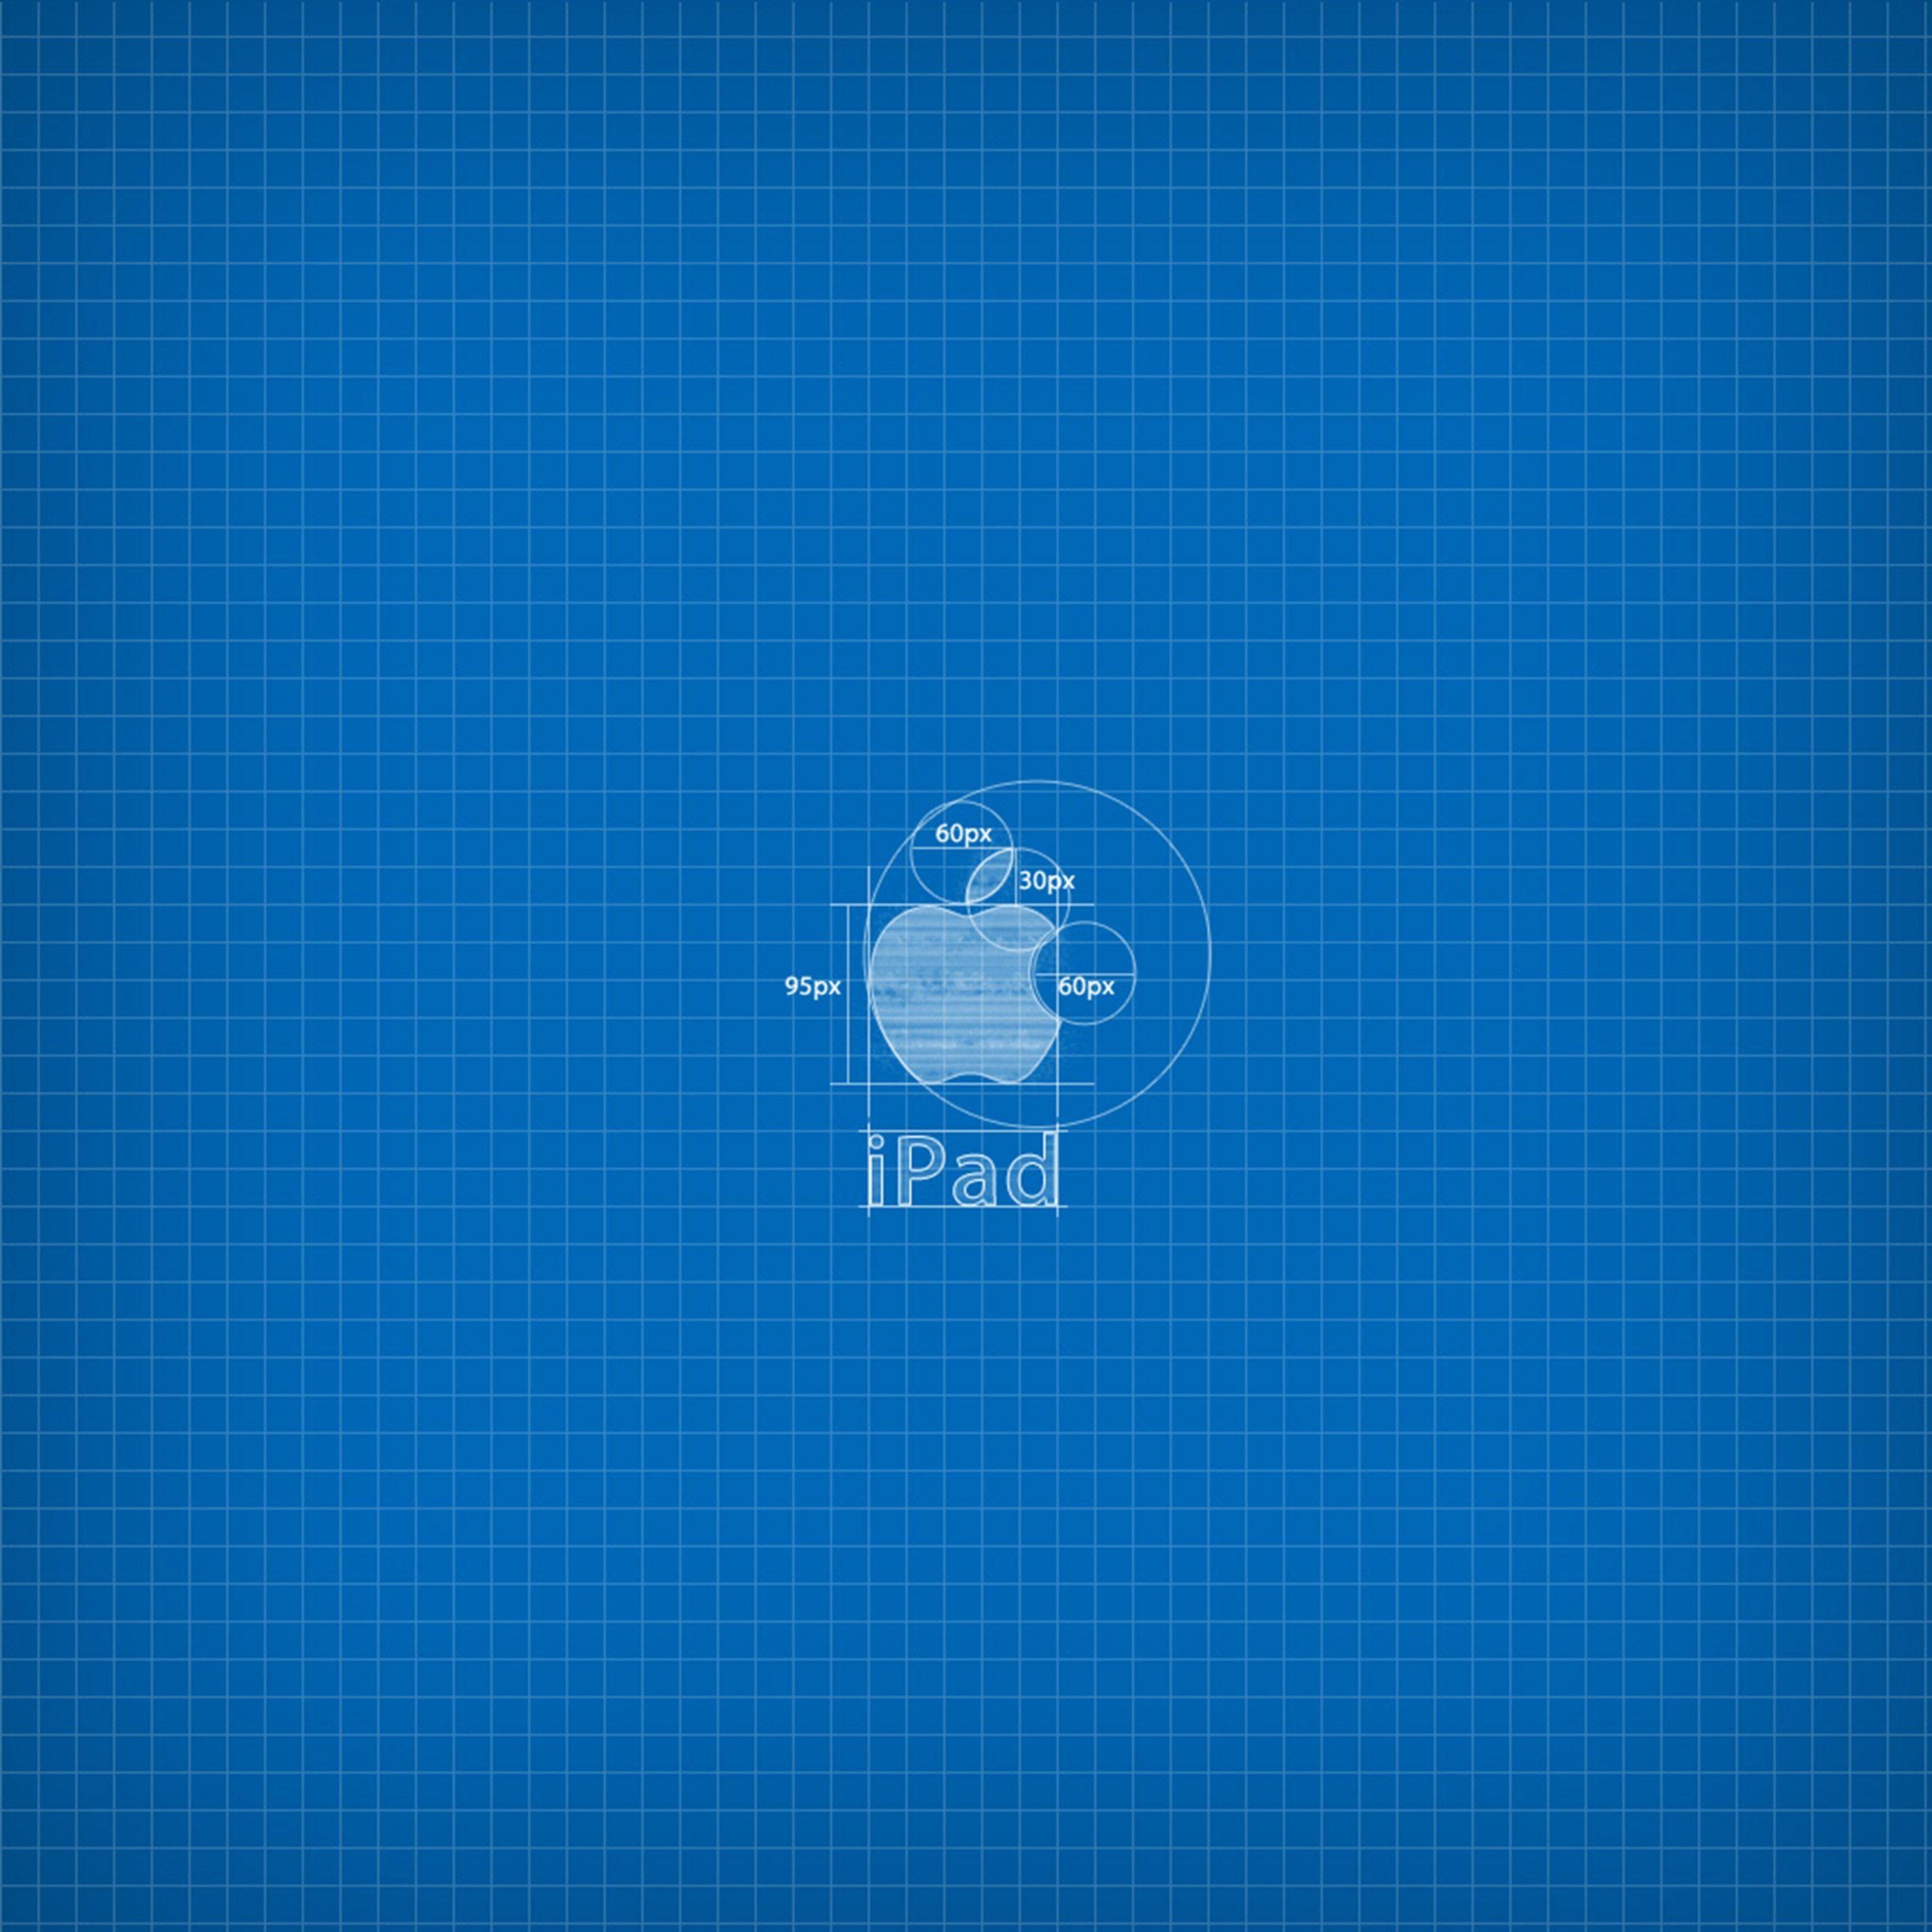 2780x2780 Parallax wallpaper 4k Apple Blueprint Ipad Wallpaper 2780x2780 pixels resolution